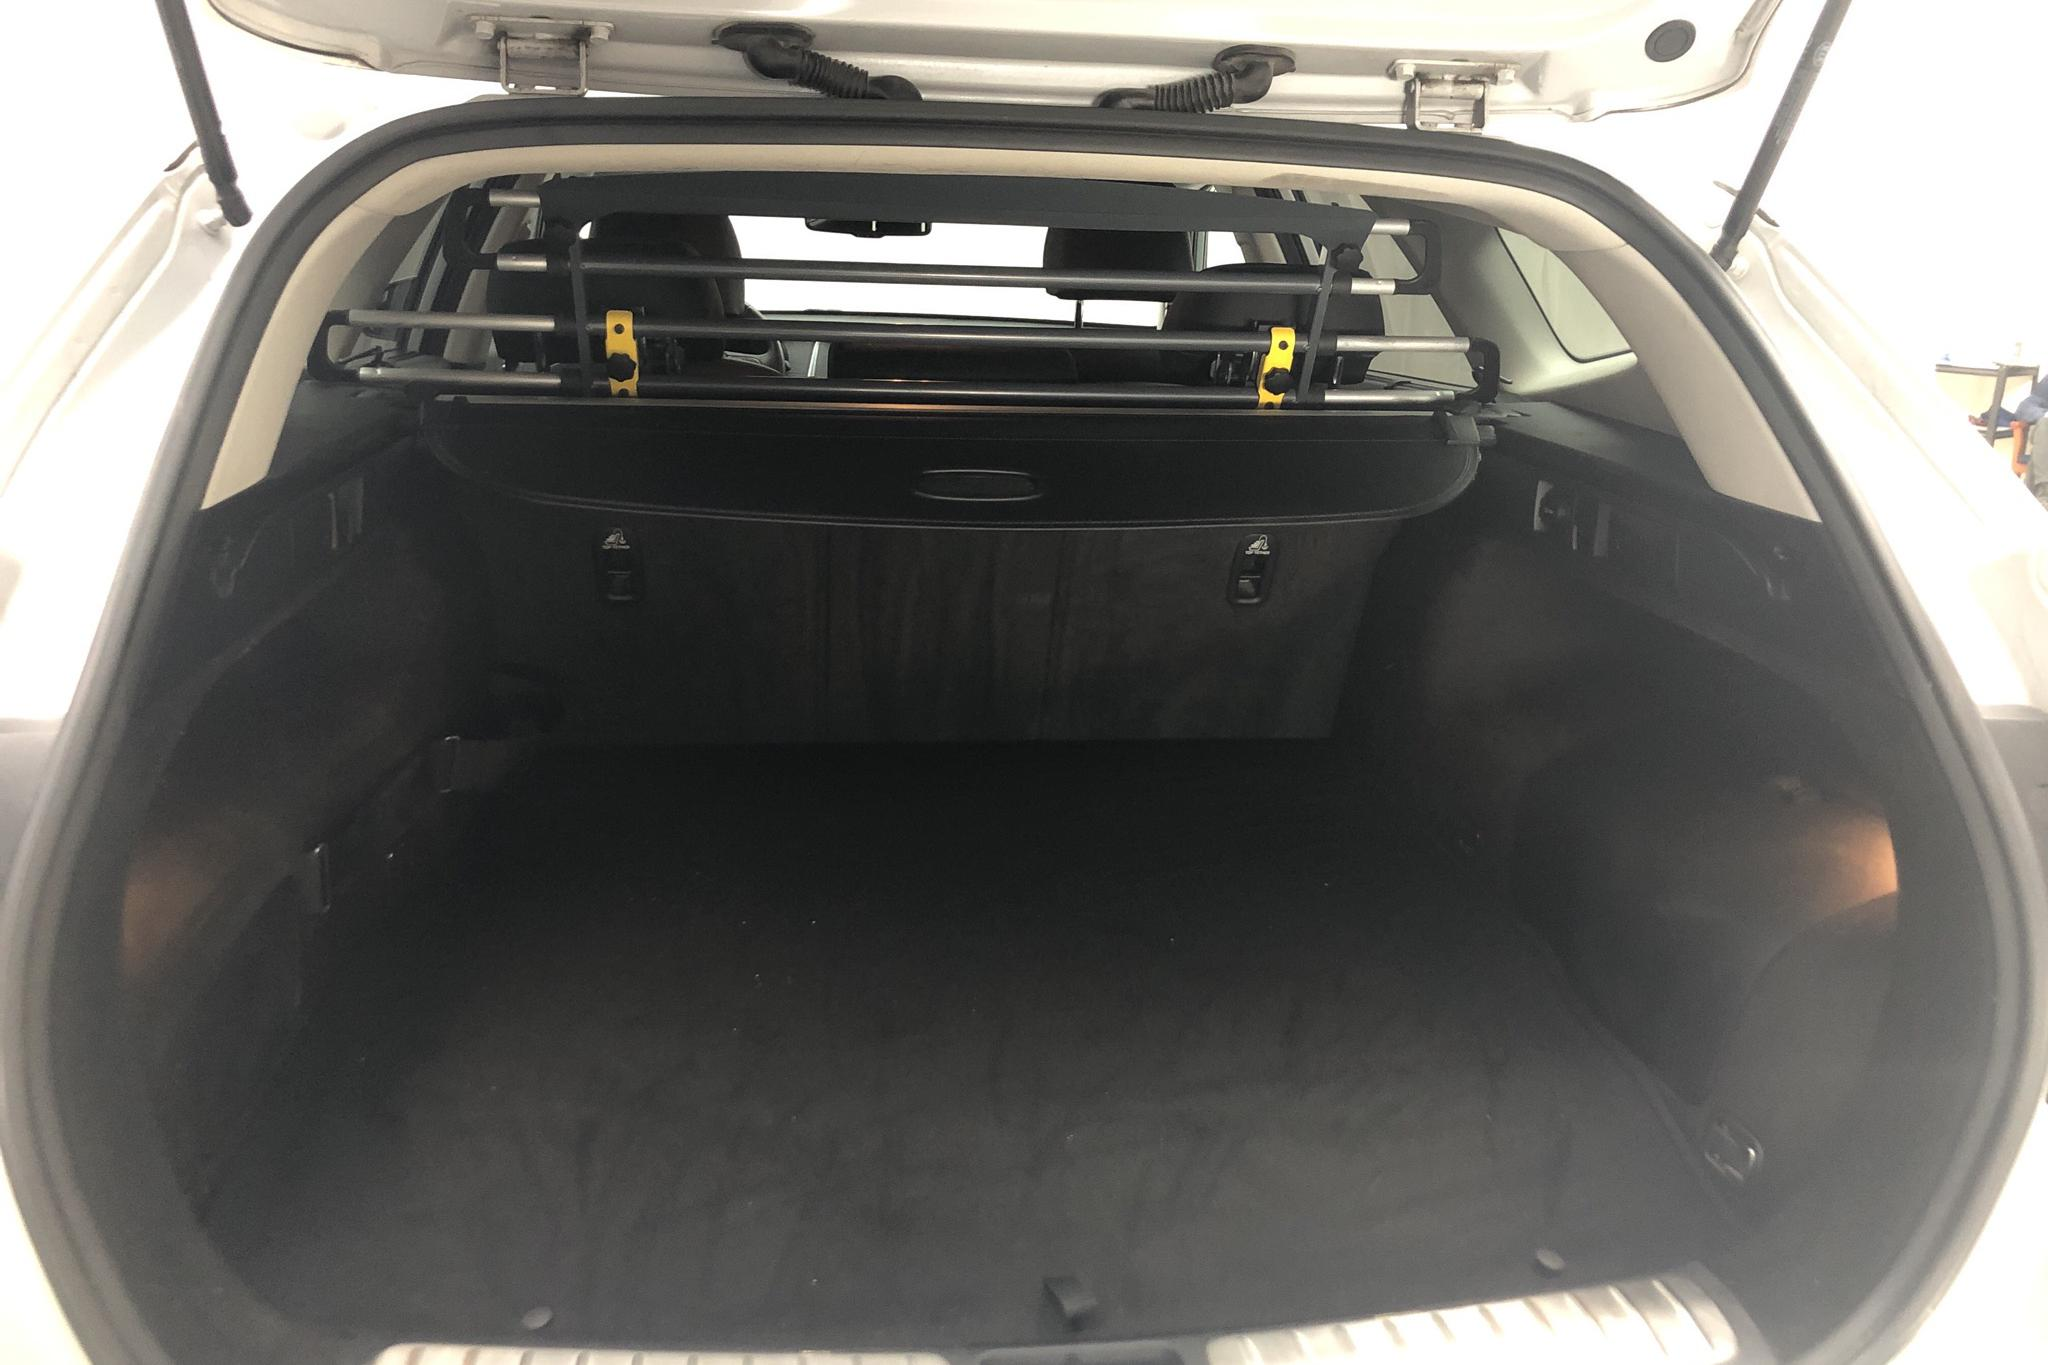 KIA Optima 2.0 GDi Plug-in Hybrid SW (205hk) - 92 680 km - Automatic - gray - 2018